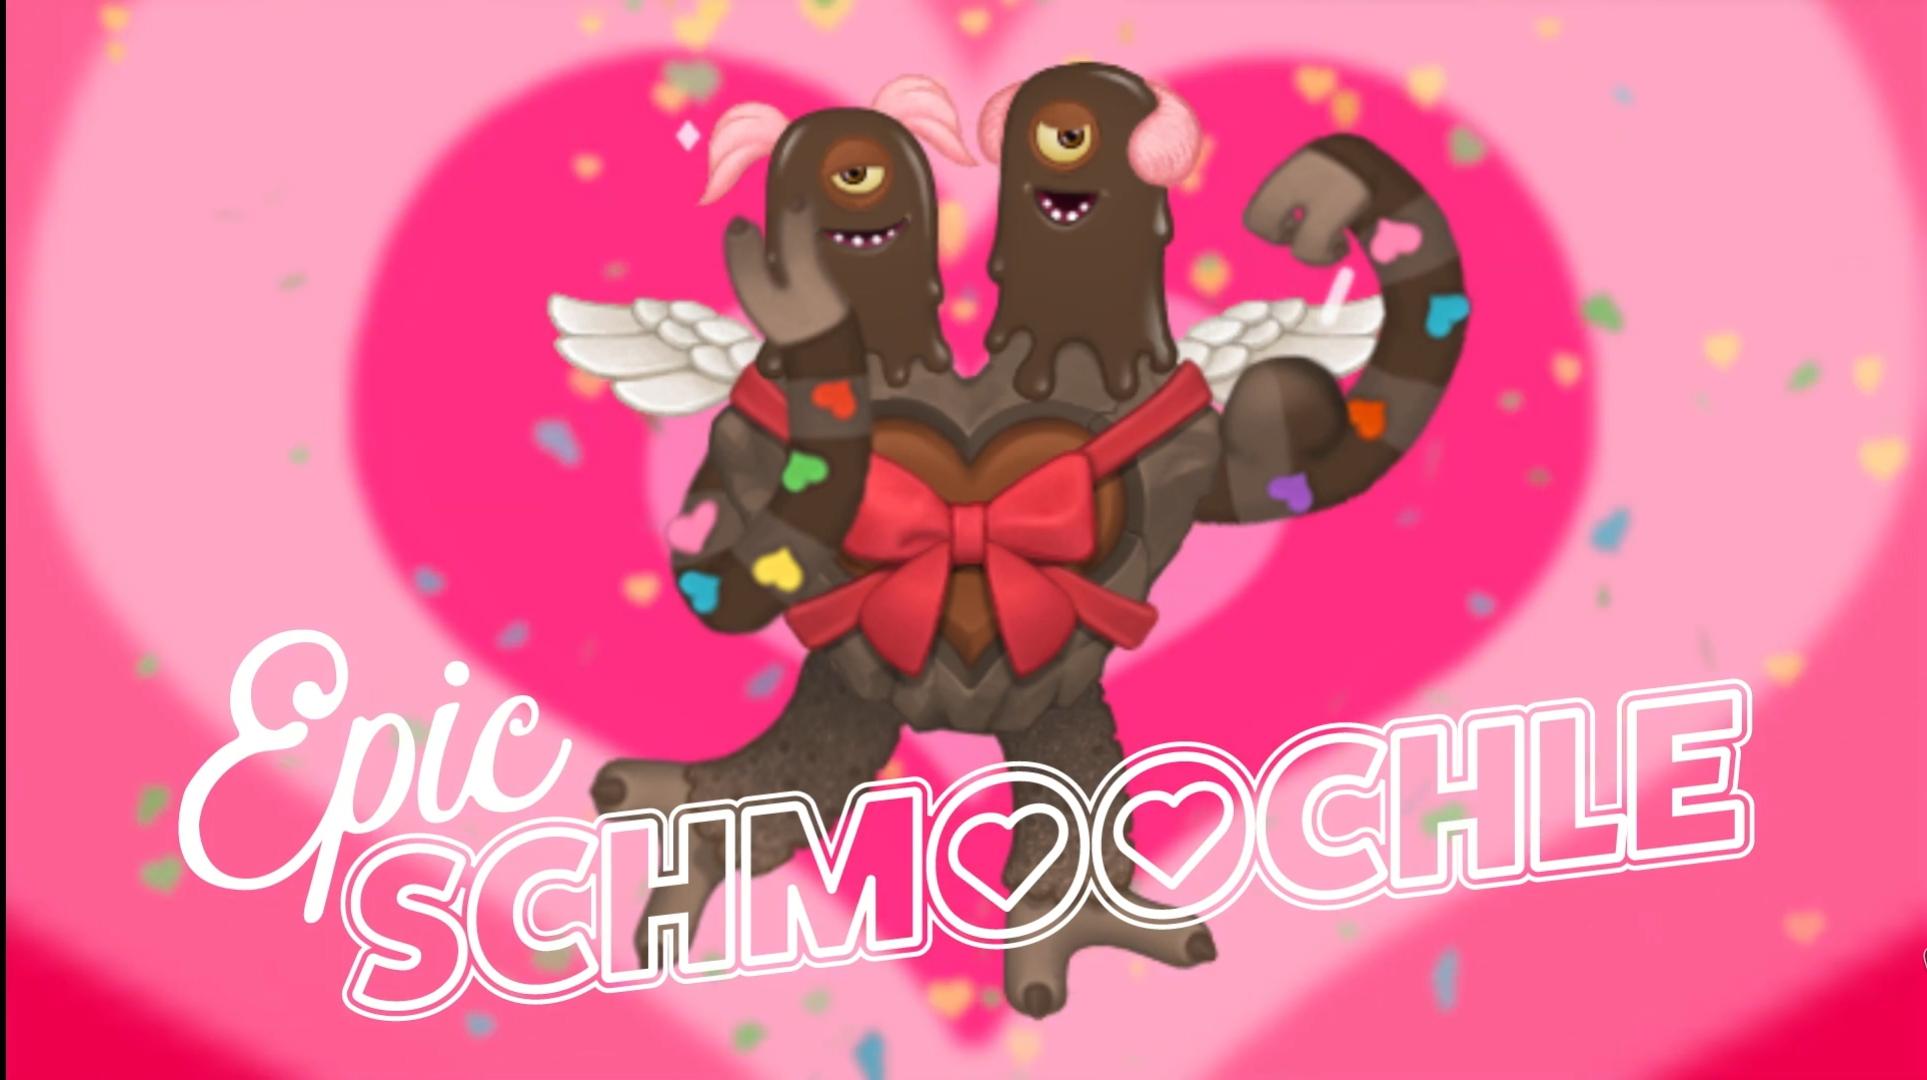 Epic Schmoochle!